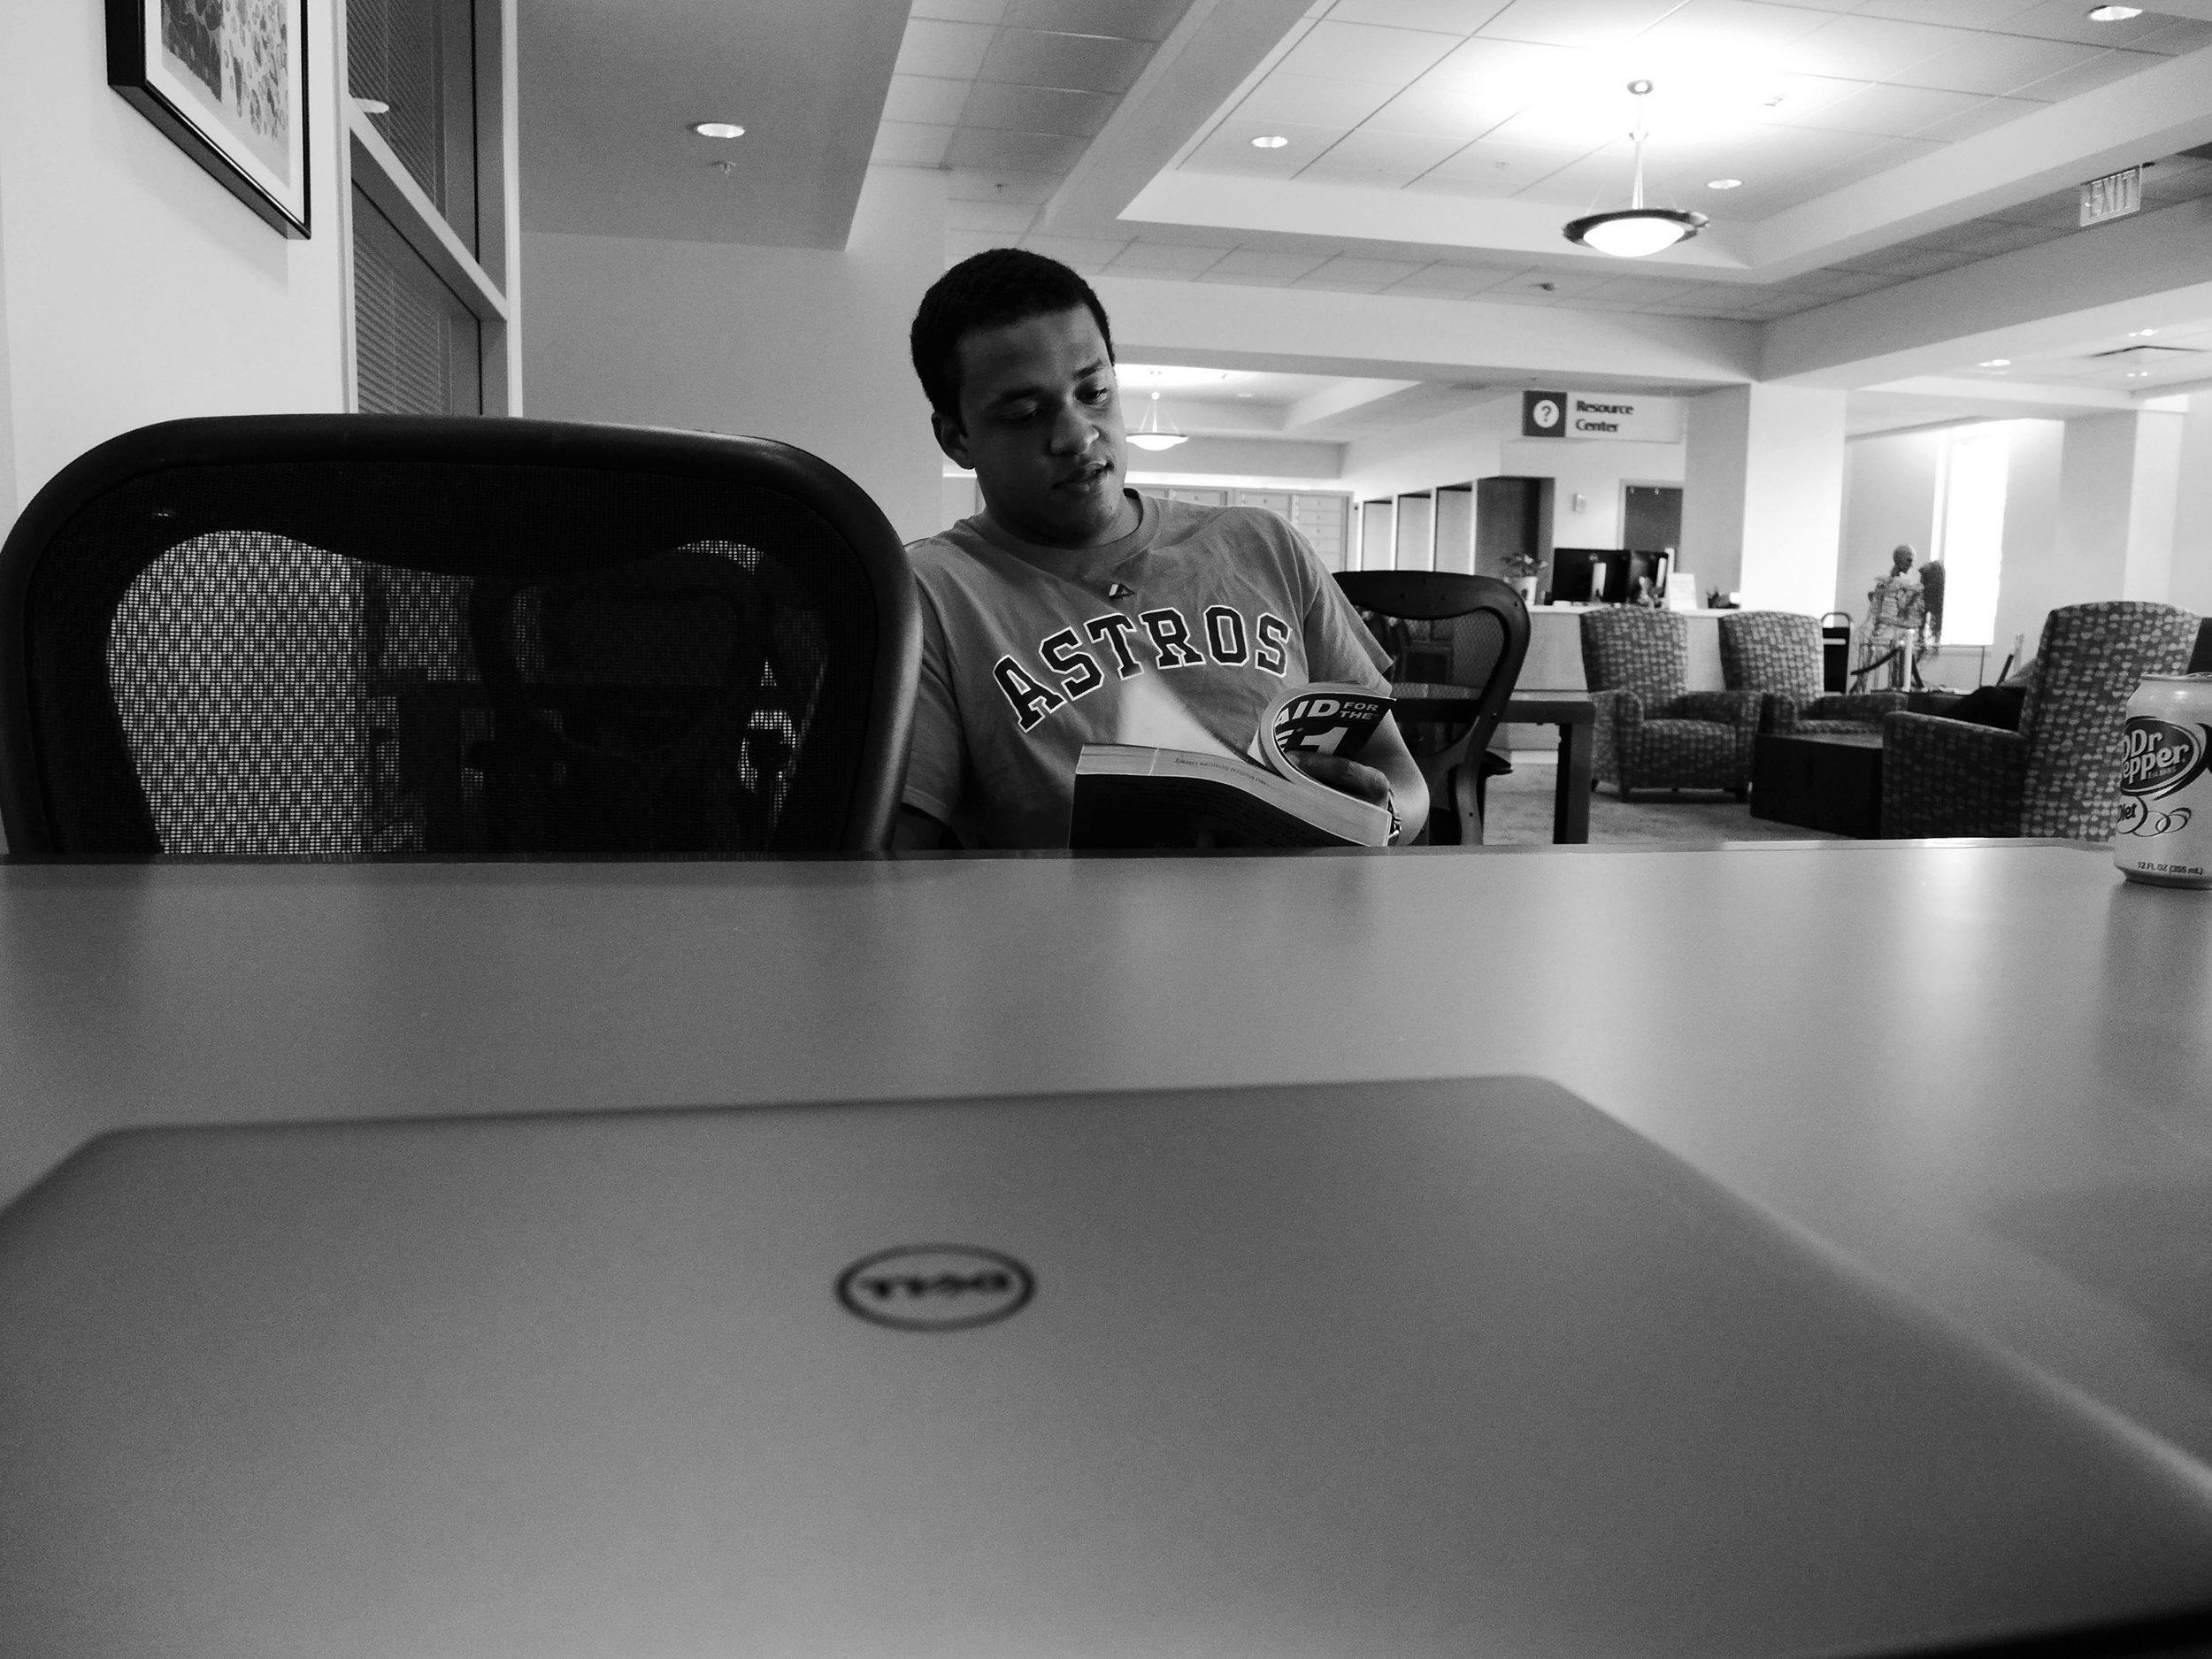 Seriously Studious Studiers Studying Studiously. By Rahul Dhuka, M2.